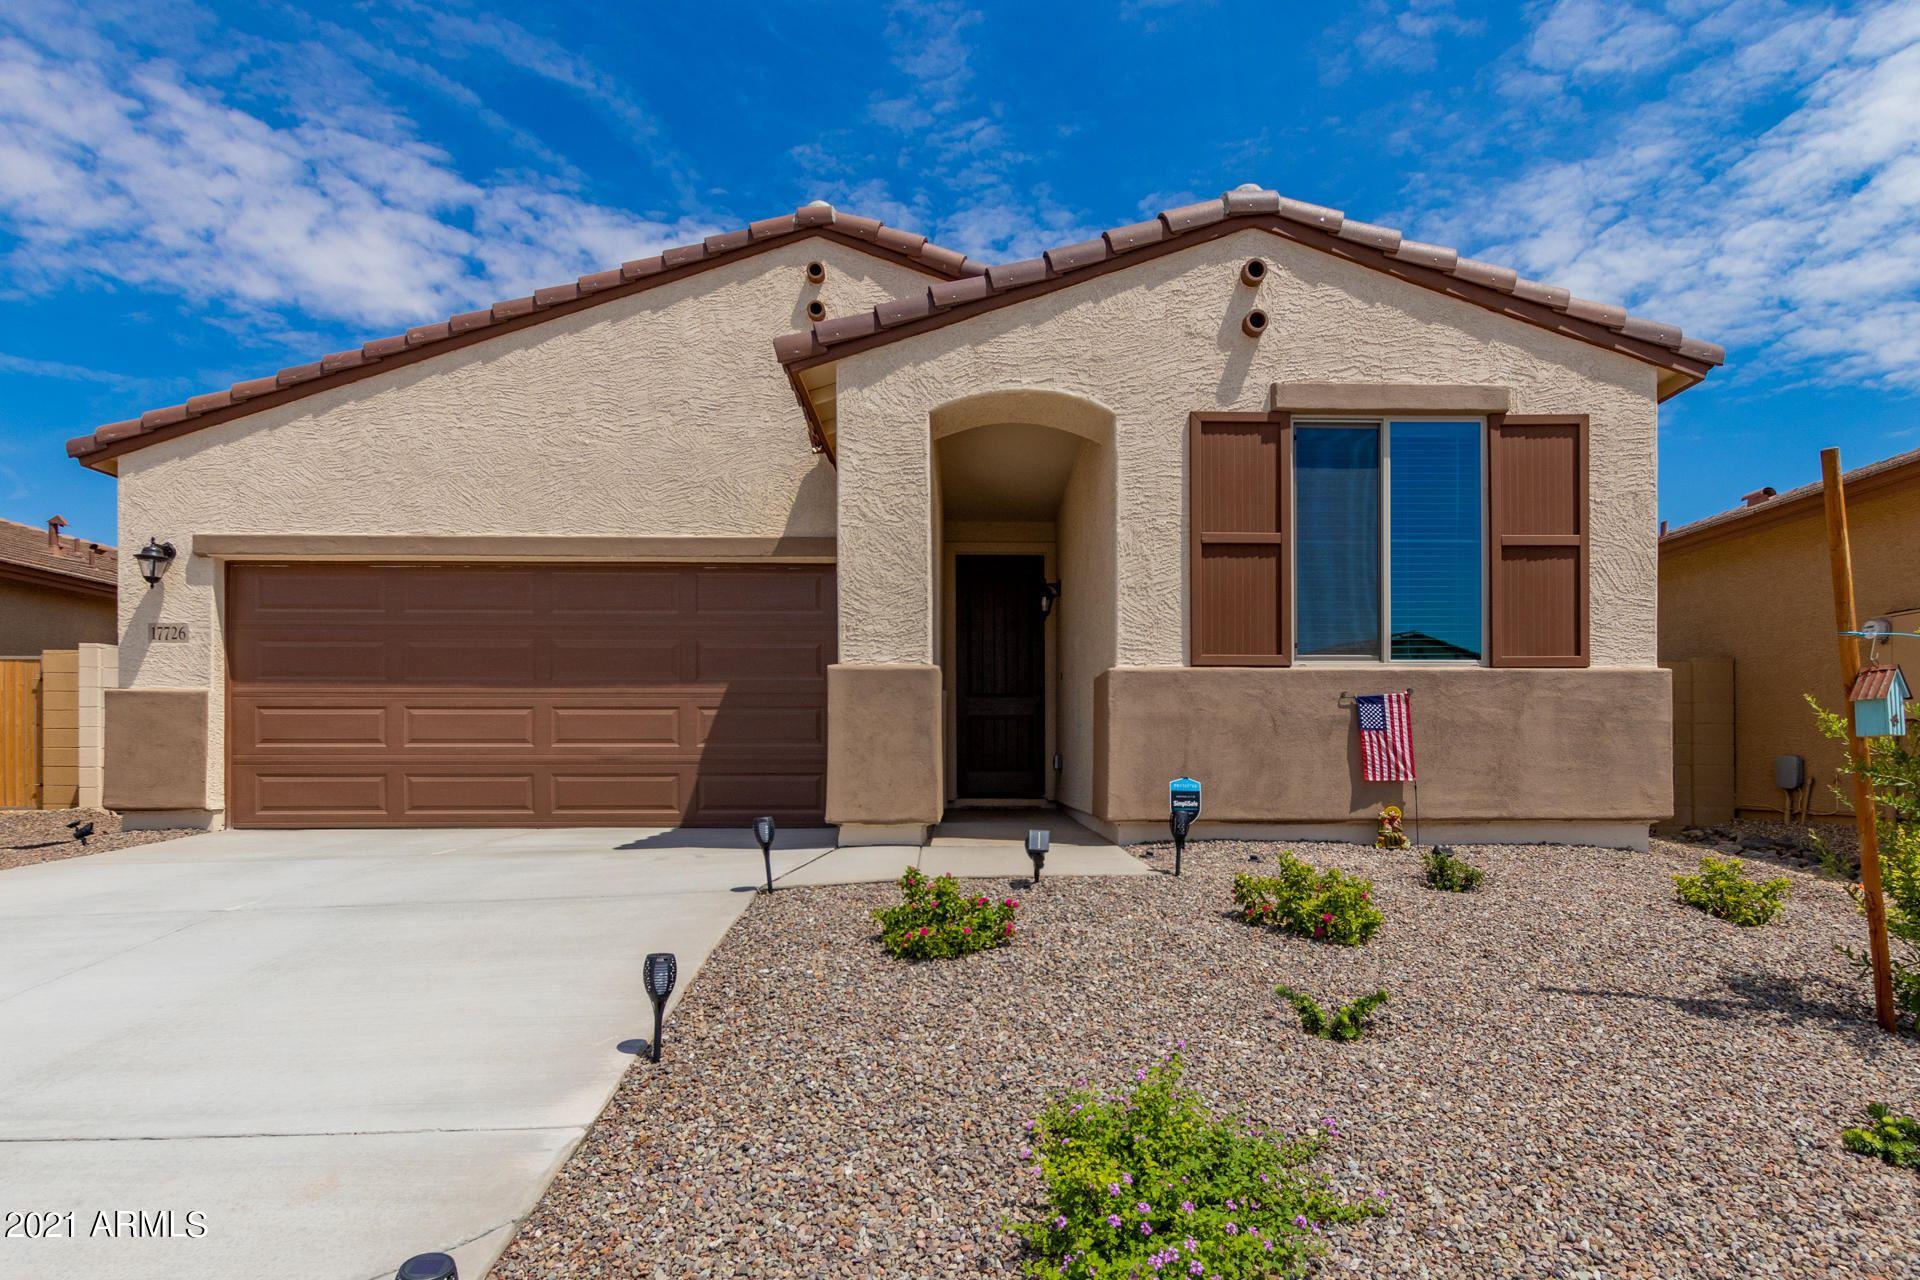 Photo of 17726 W CASHMAN Drive, Surprise, AZ 85387 (MLS # 6270734)